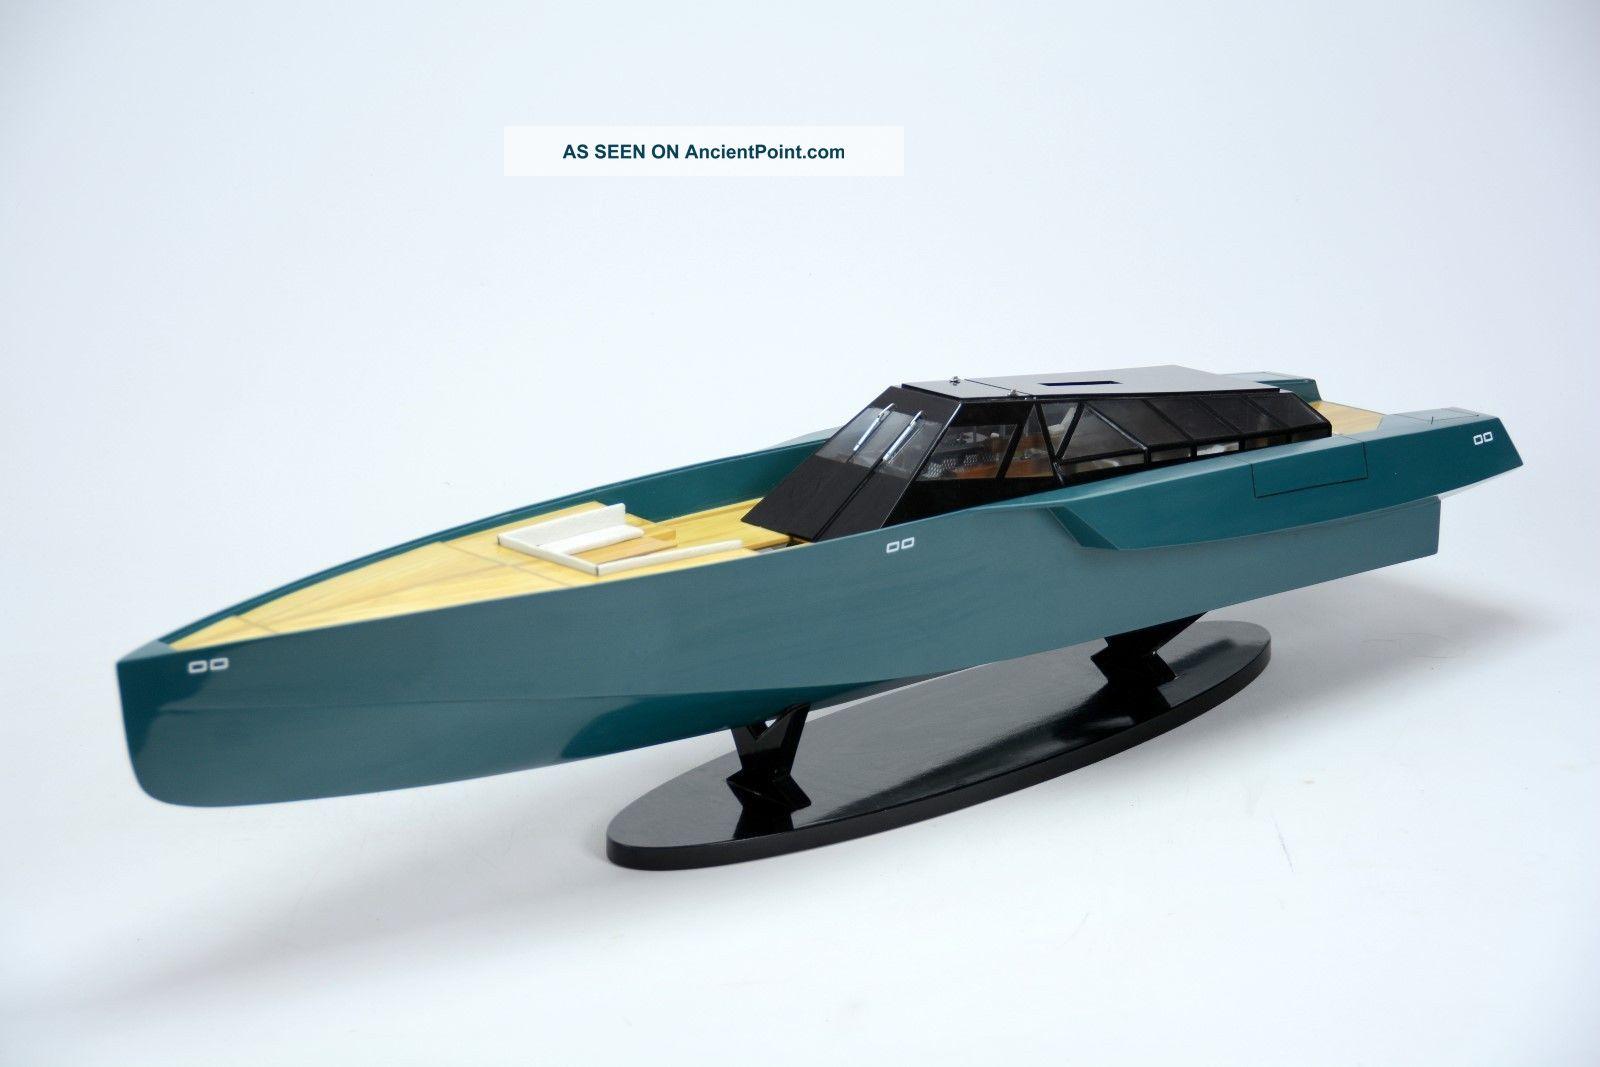 118 Wally Power Luxury Motor Yacht - Handmade Wooden Racing Boat Model